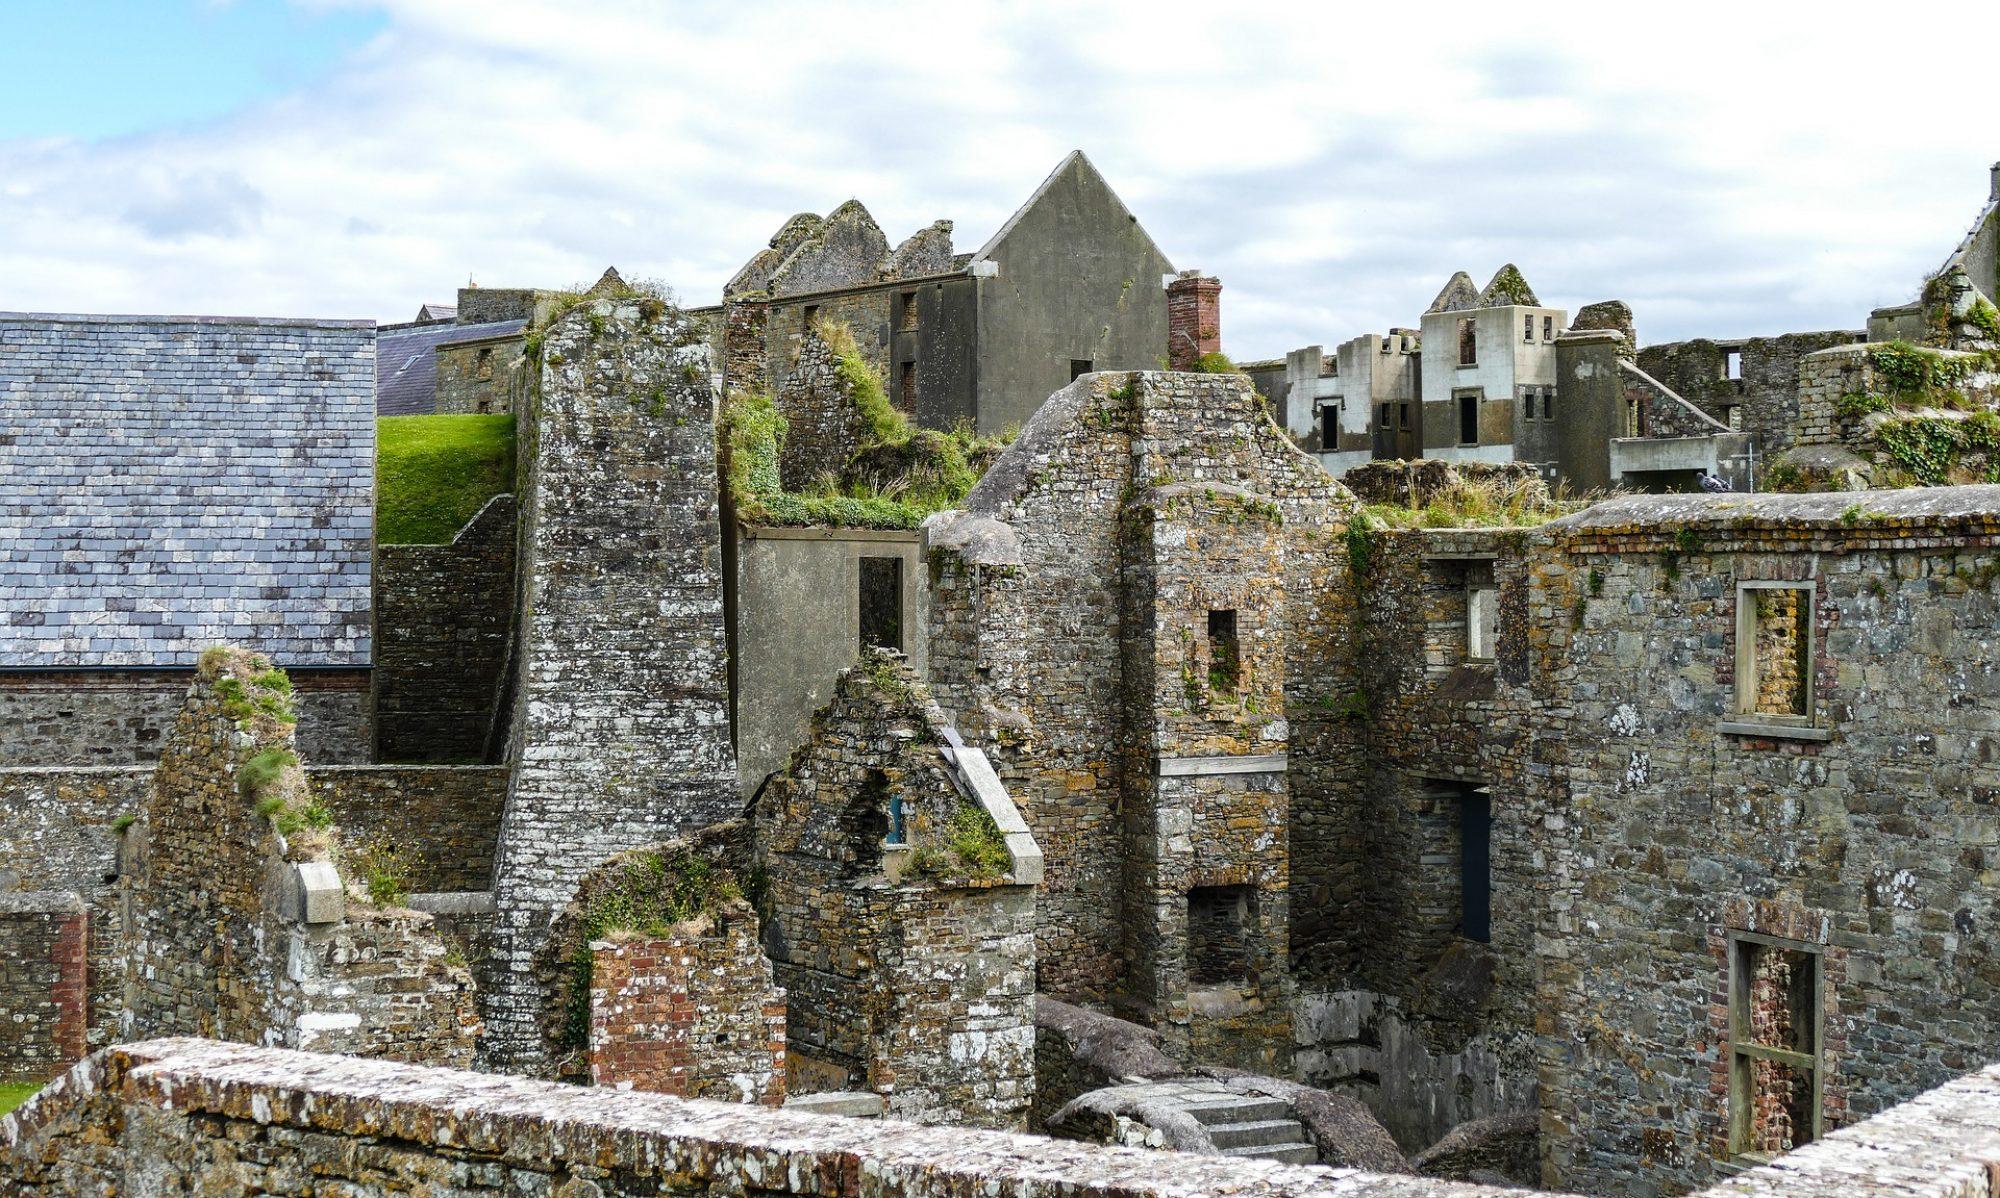 Principia College Ireland Abroad Summer 2017